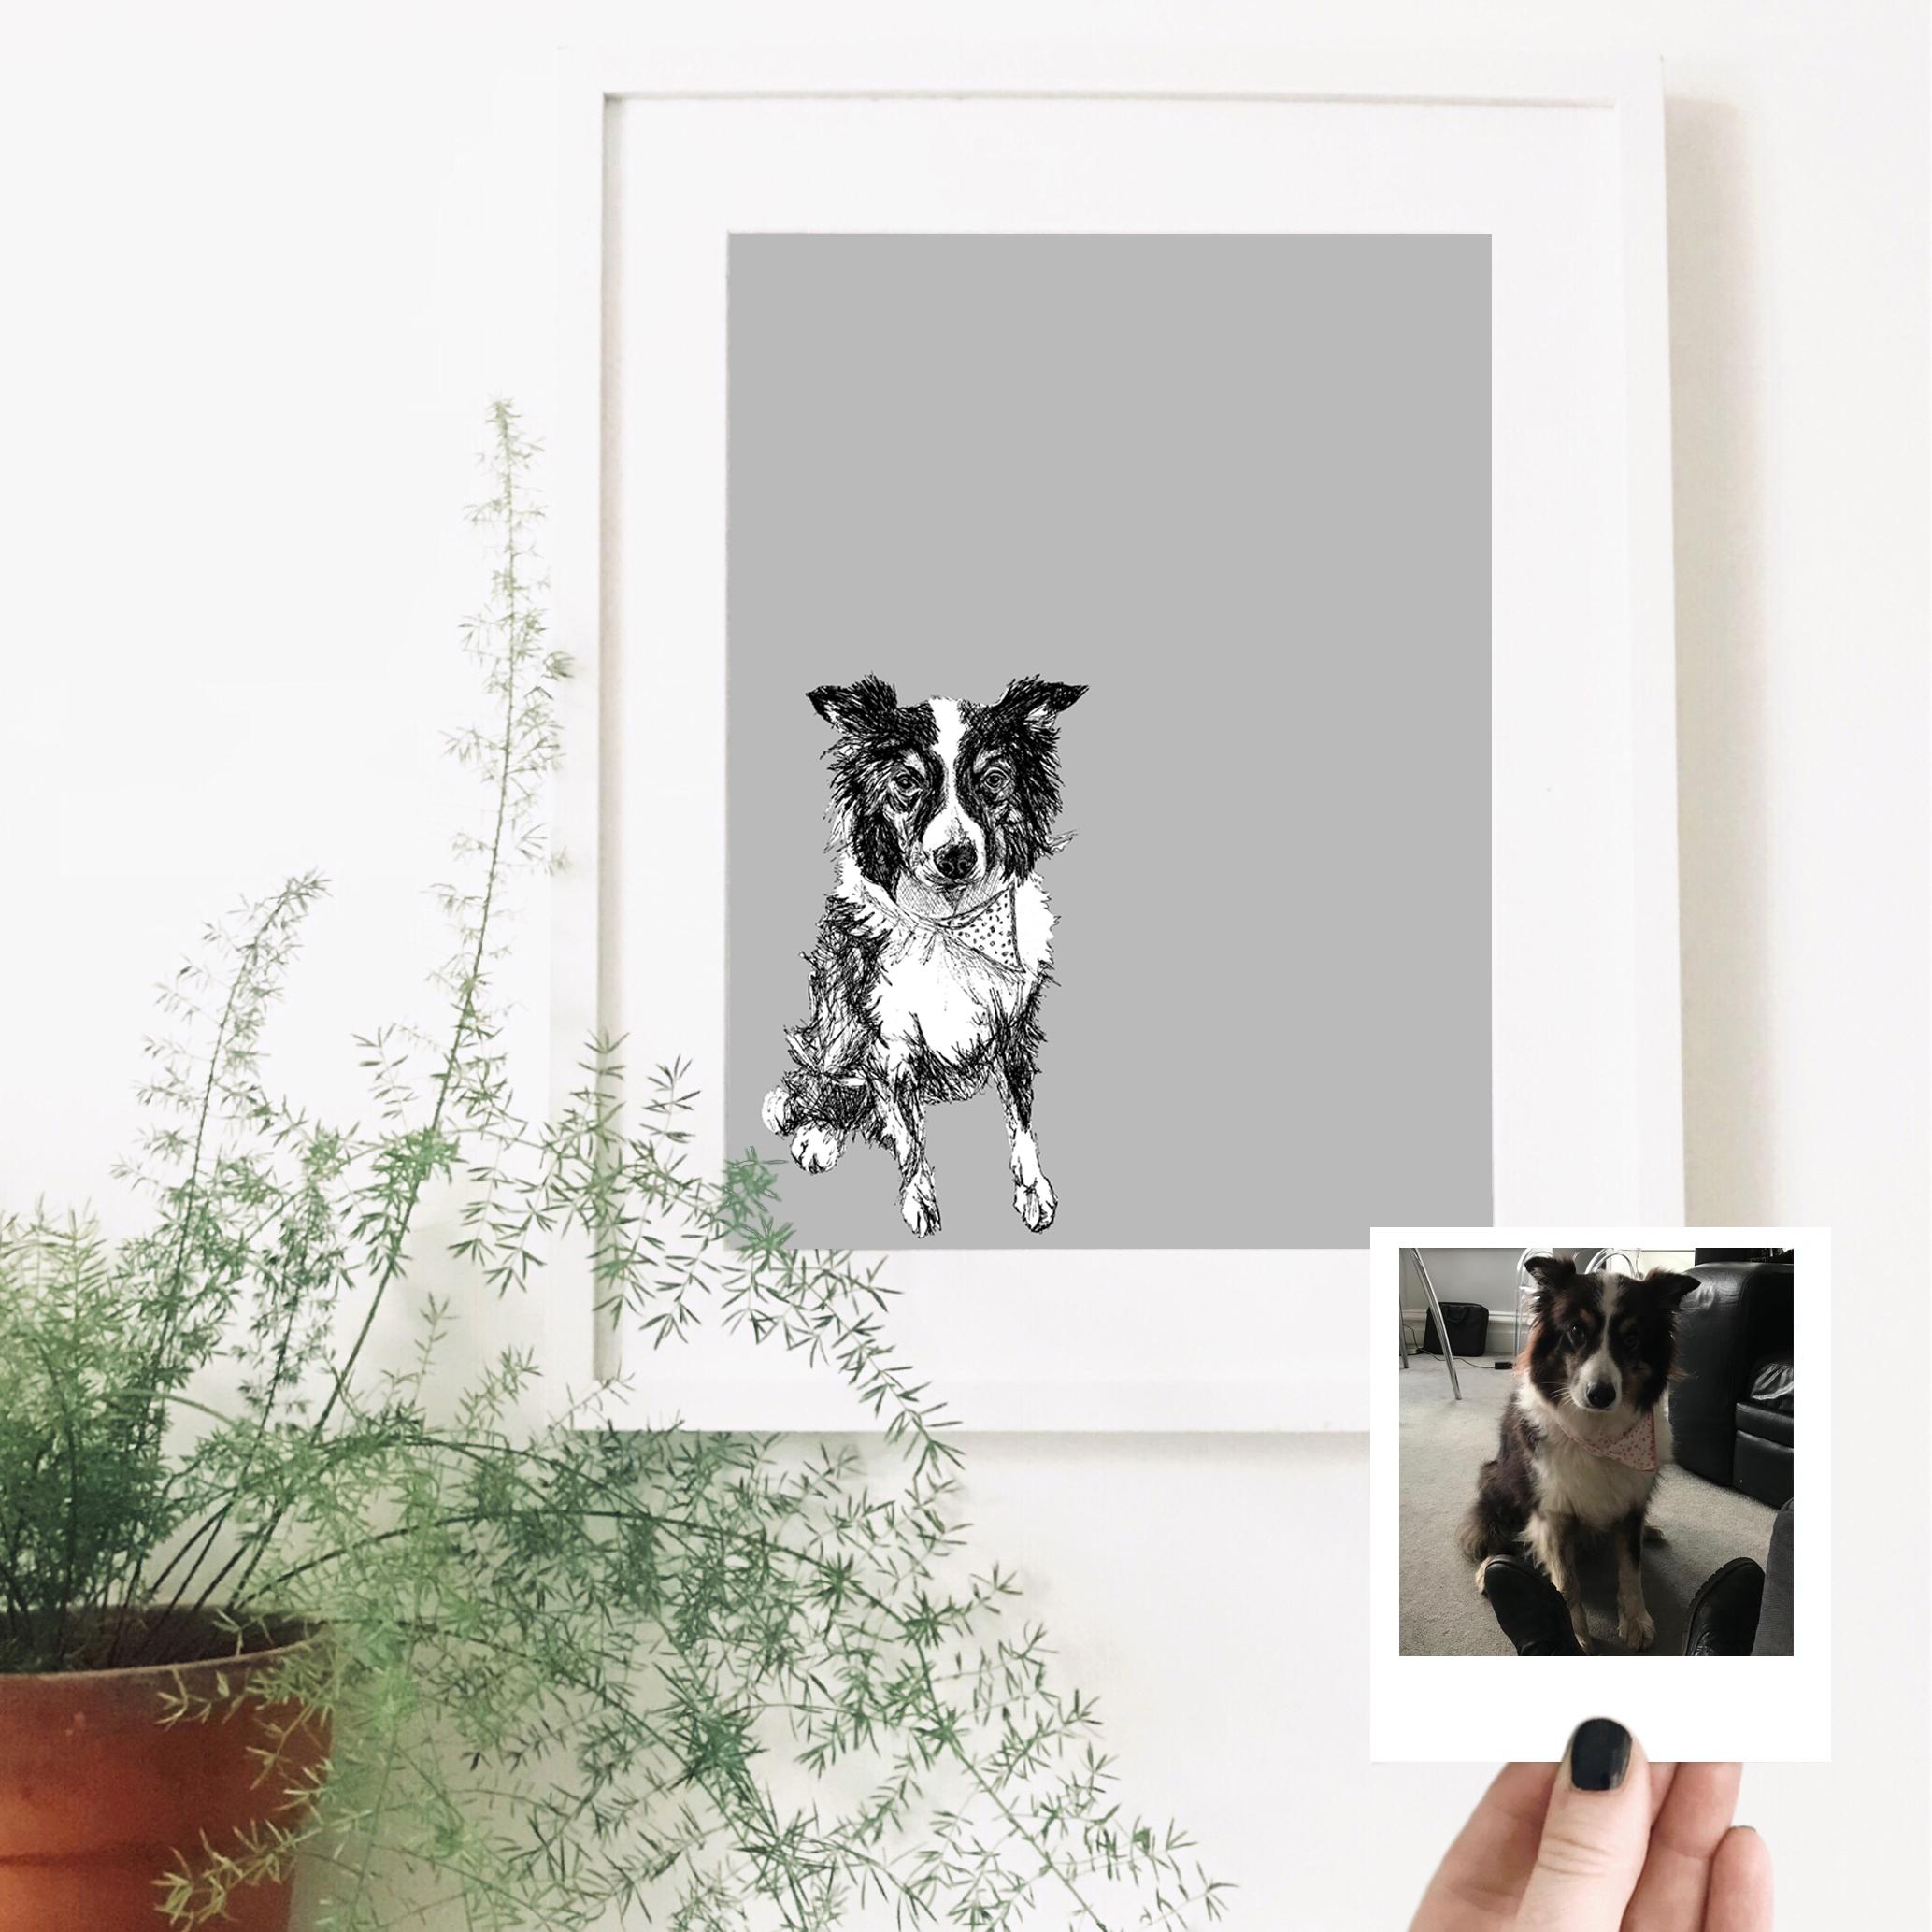 border-collie-dog-pet-portrait-drawing.jpg